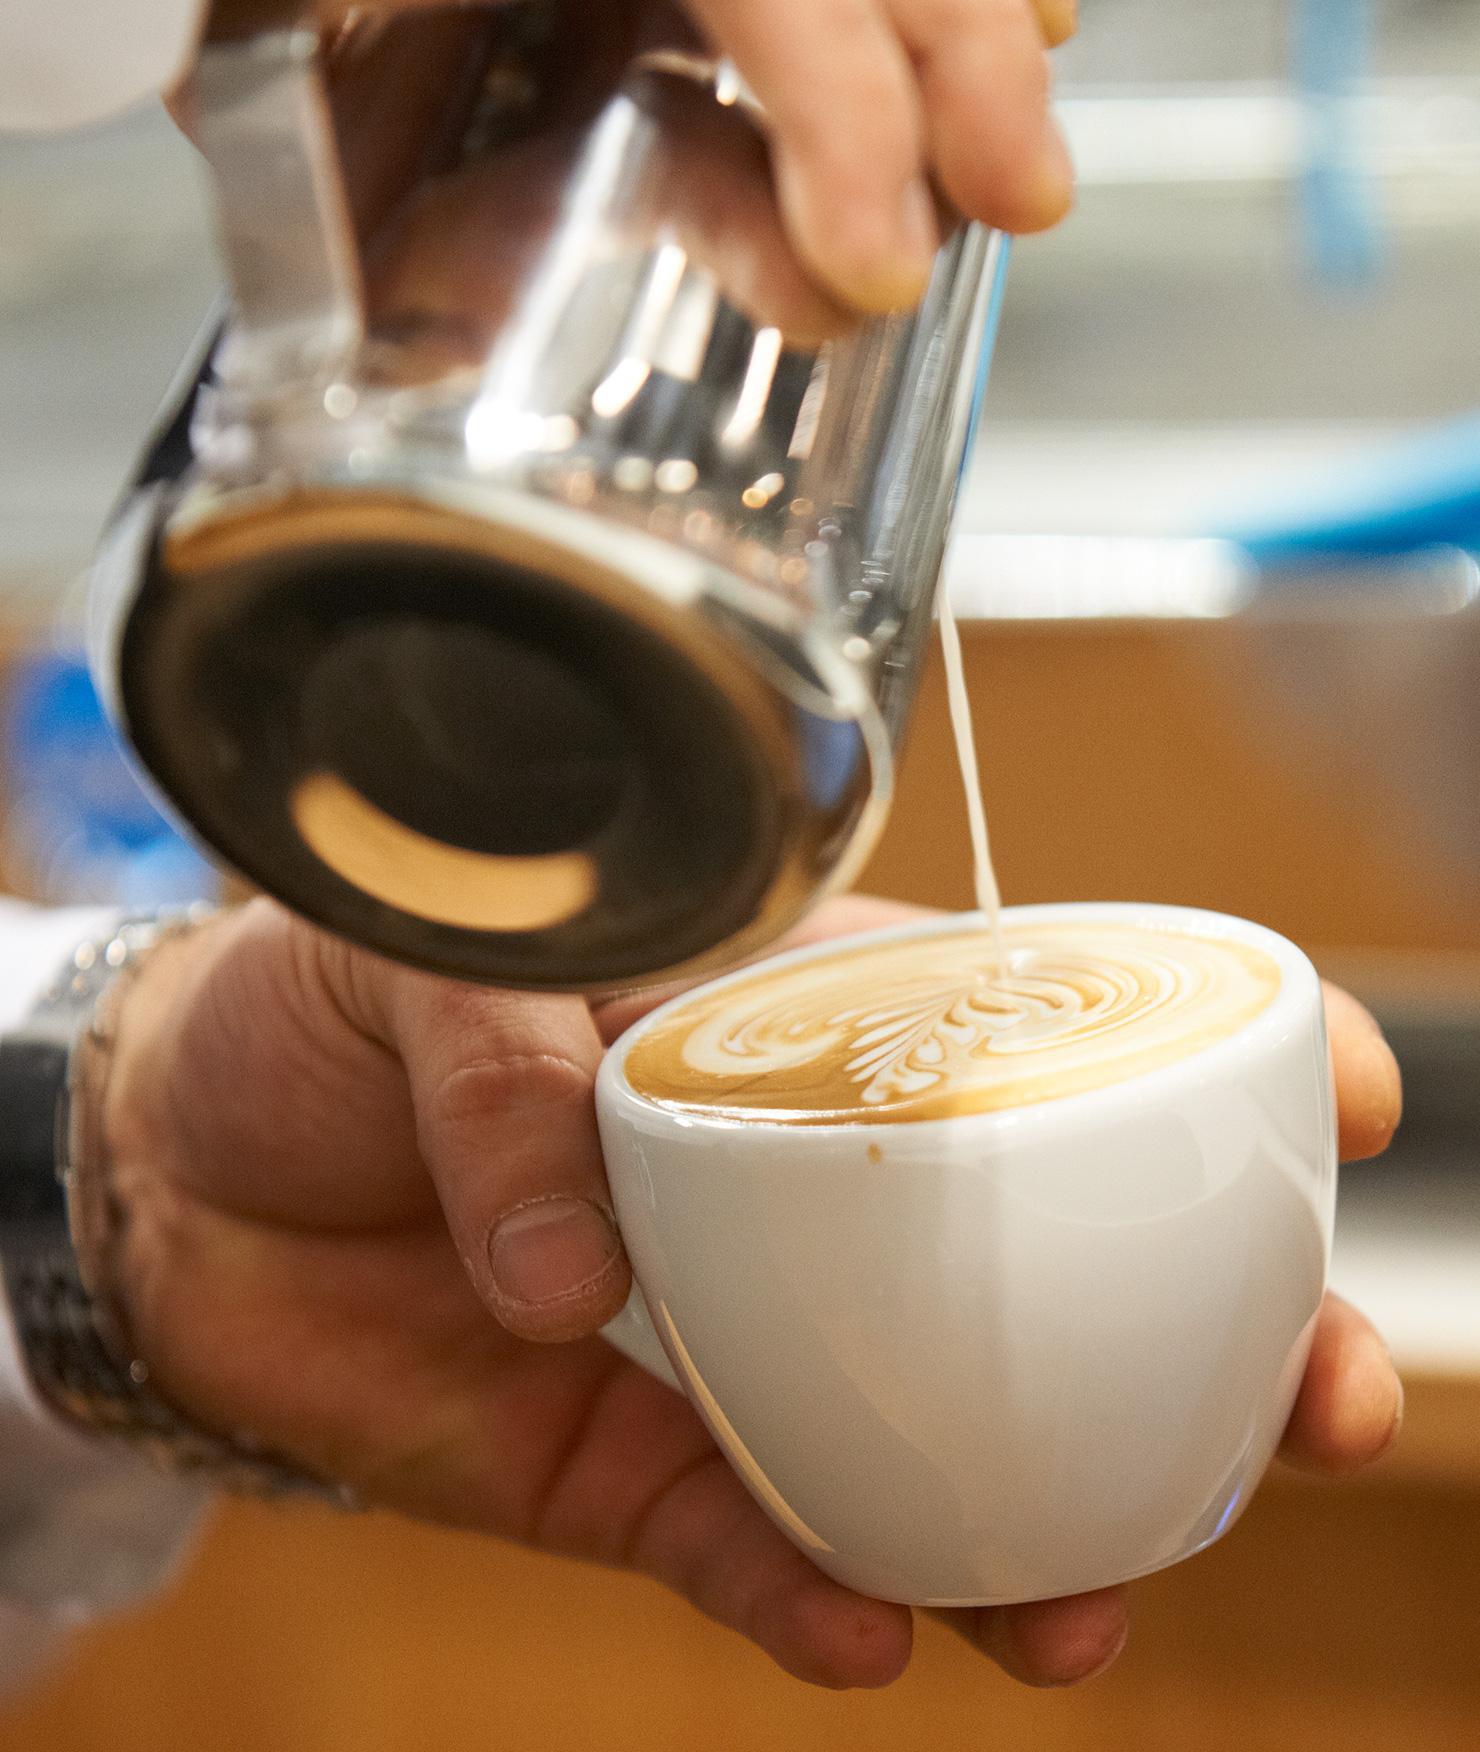 Filtr BRITA PURITY Fresh C50 barista cappuccino